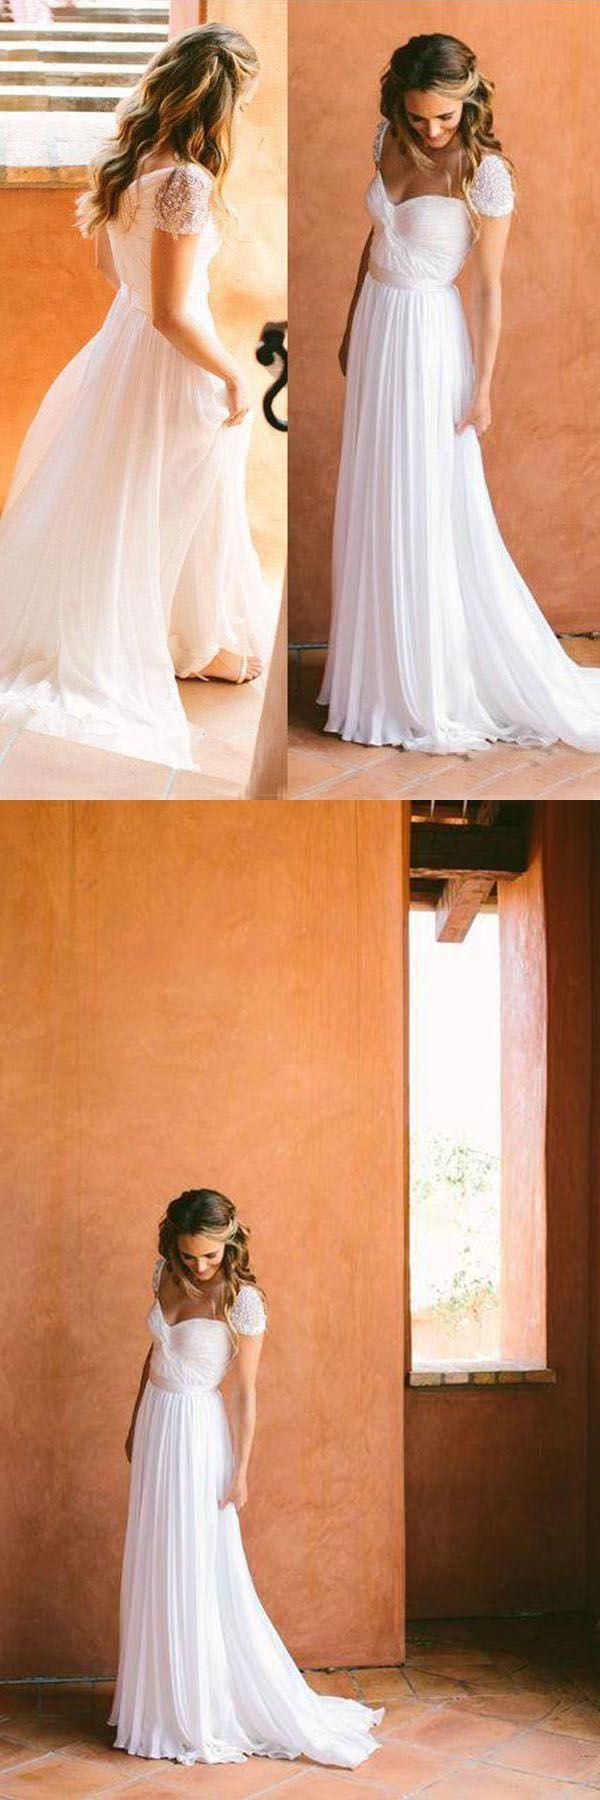 Nice Long Wedding Dresses With Chiffon A-line/Princess Zipper WD206 #wedding #dress #pgmdress